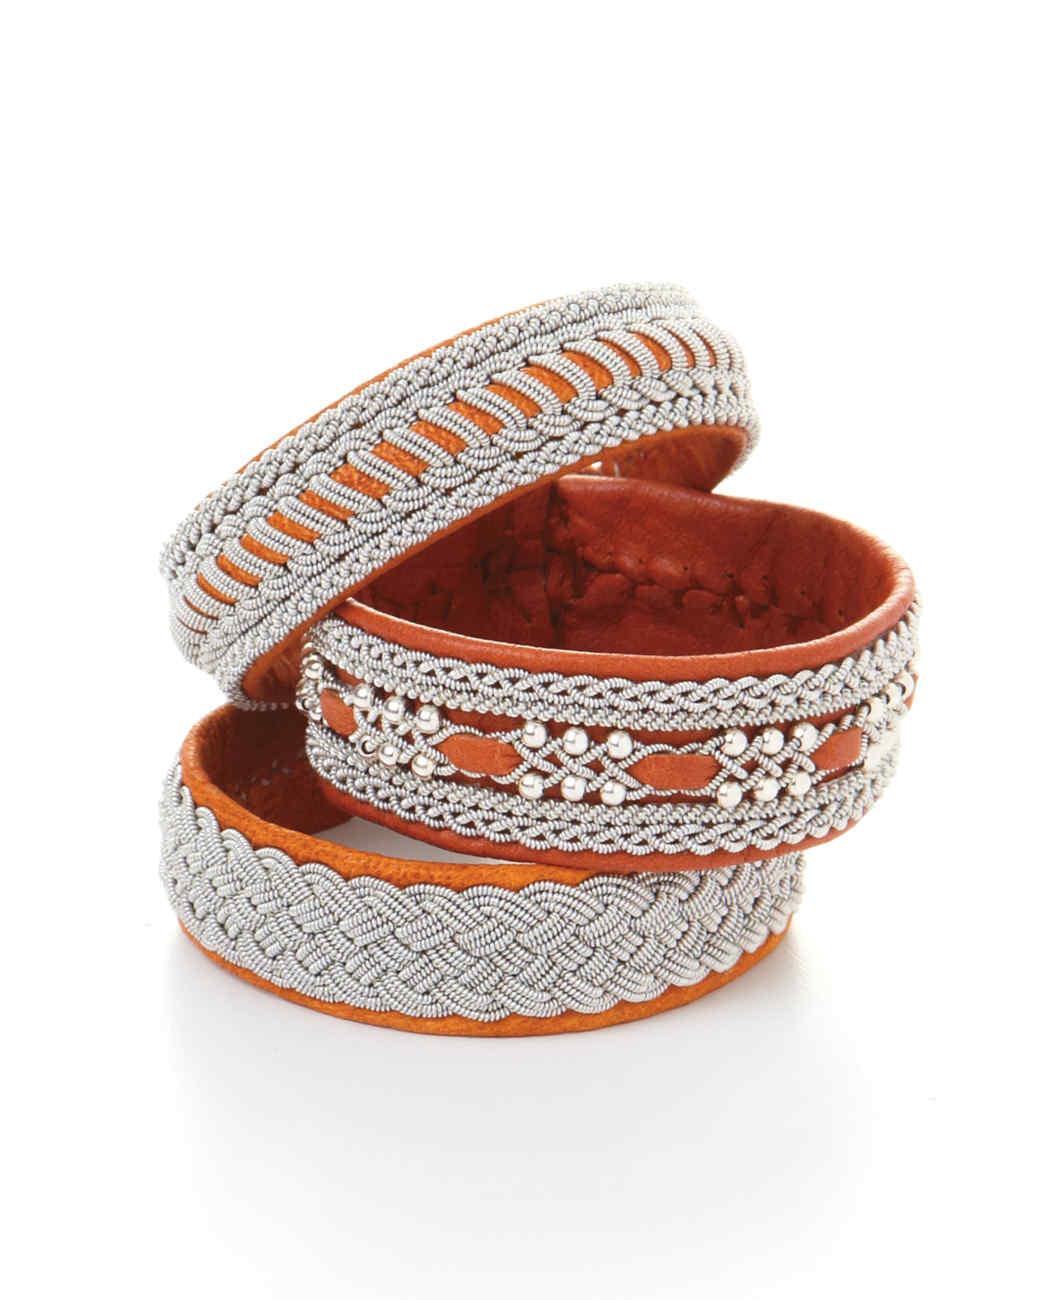 leather-bracelets-211-mld110351.jpg